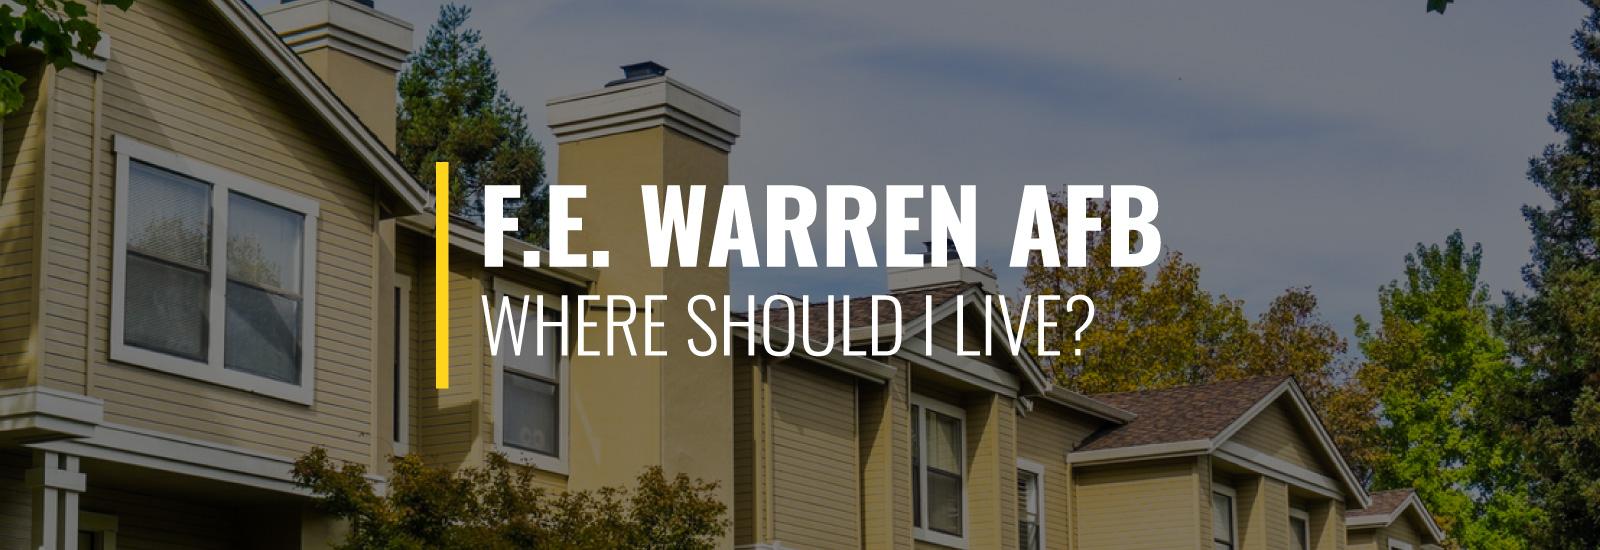 Where Should I Live Near Francis E. Warren Air Force Base?